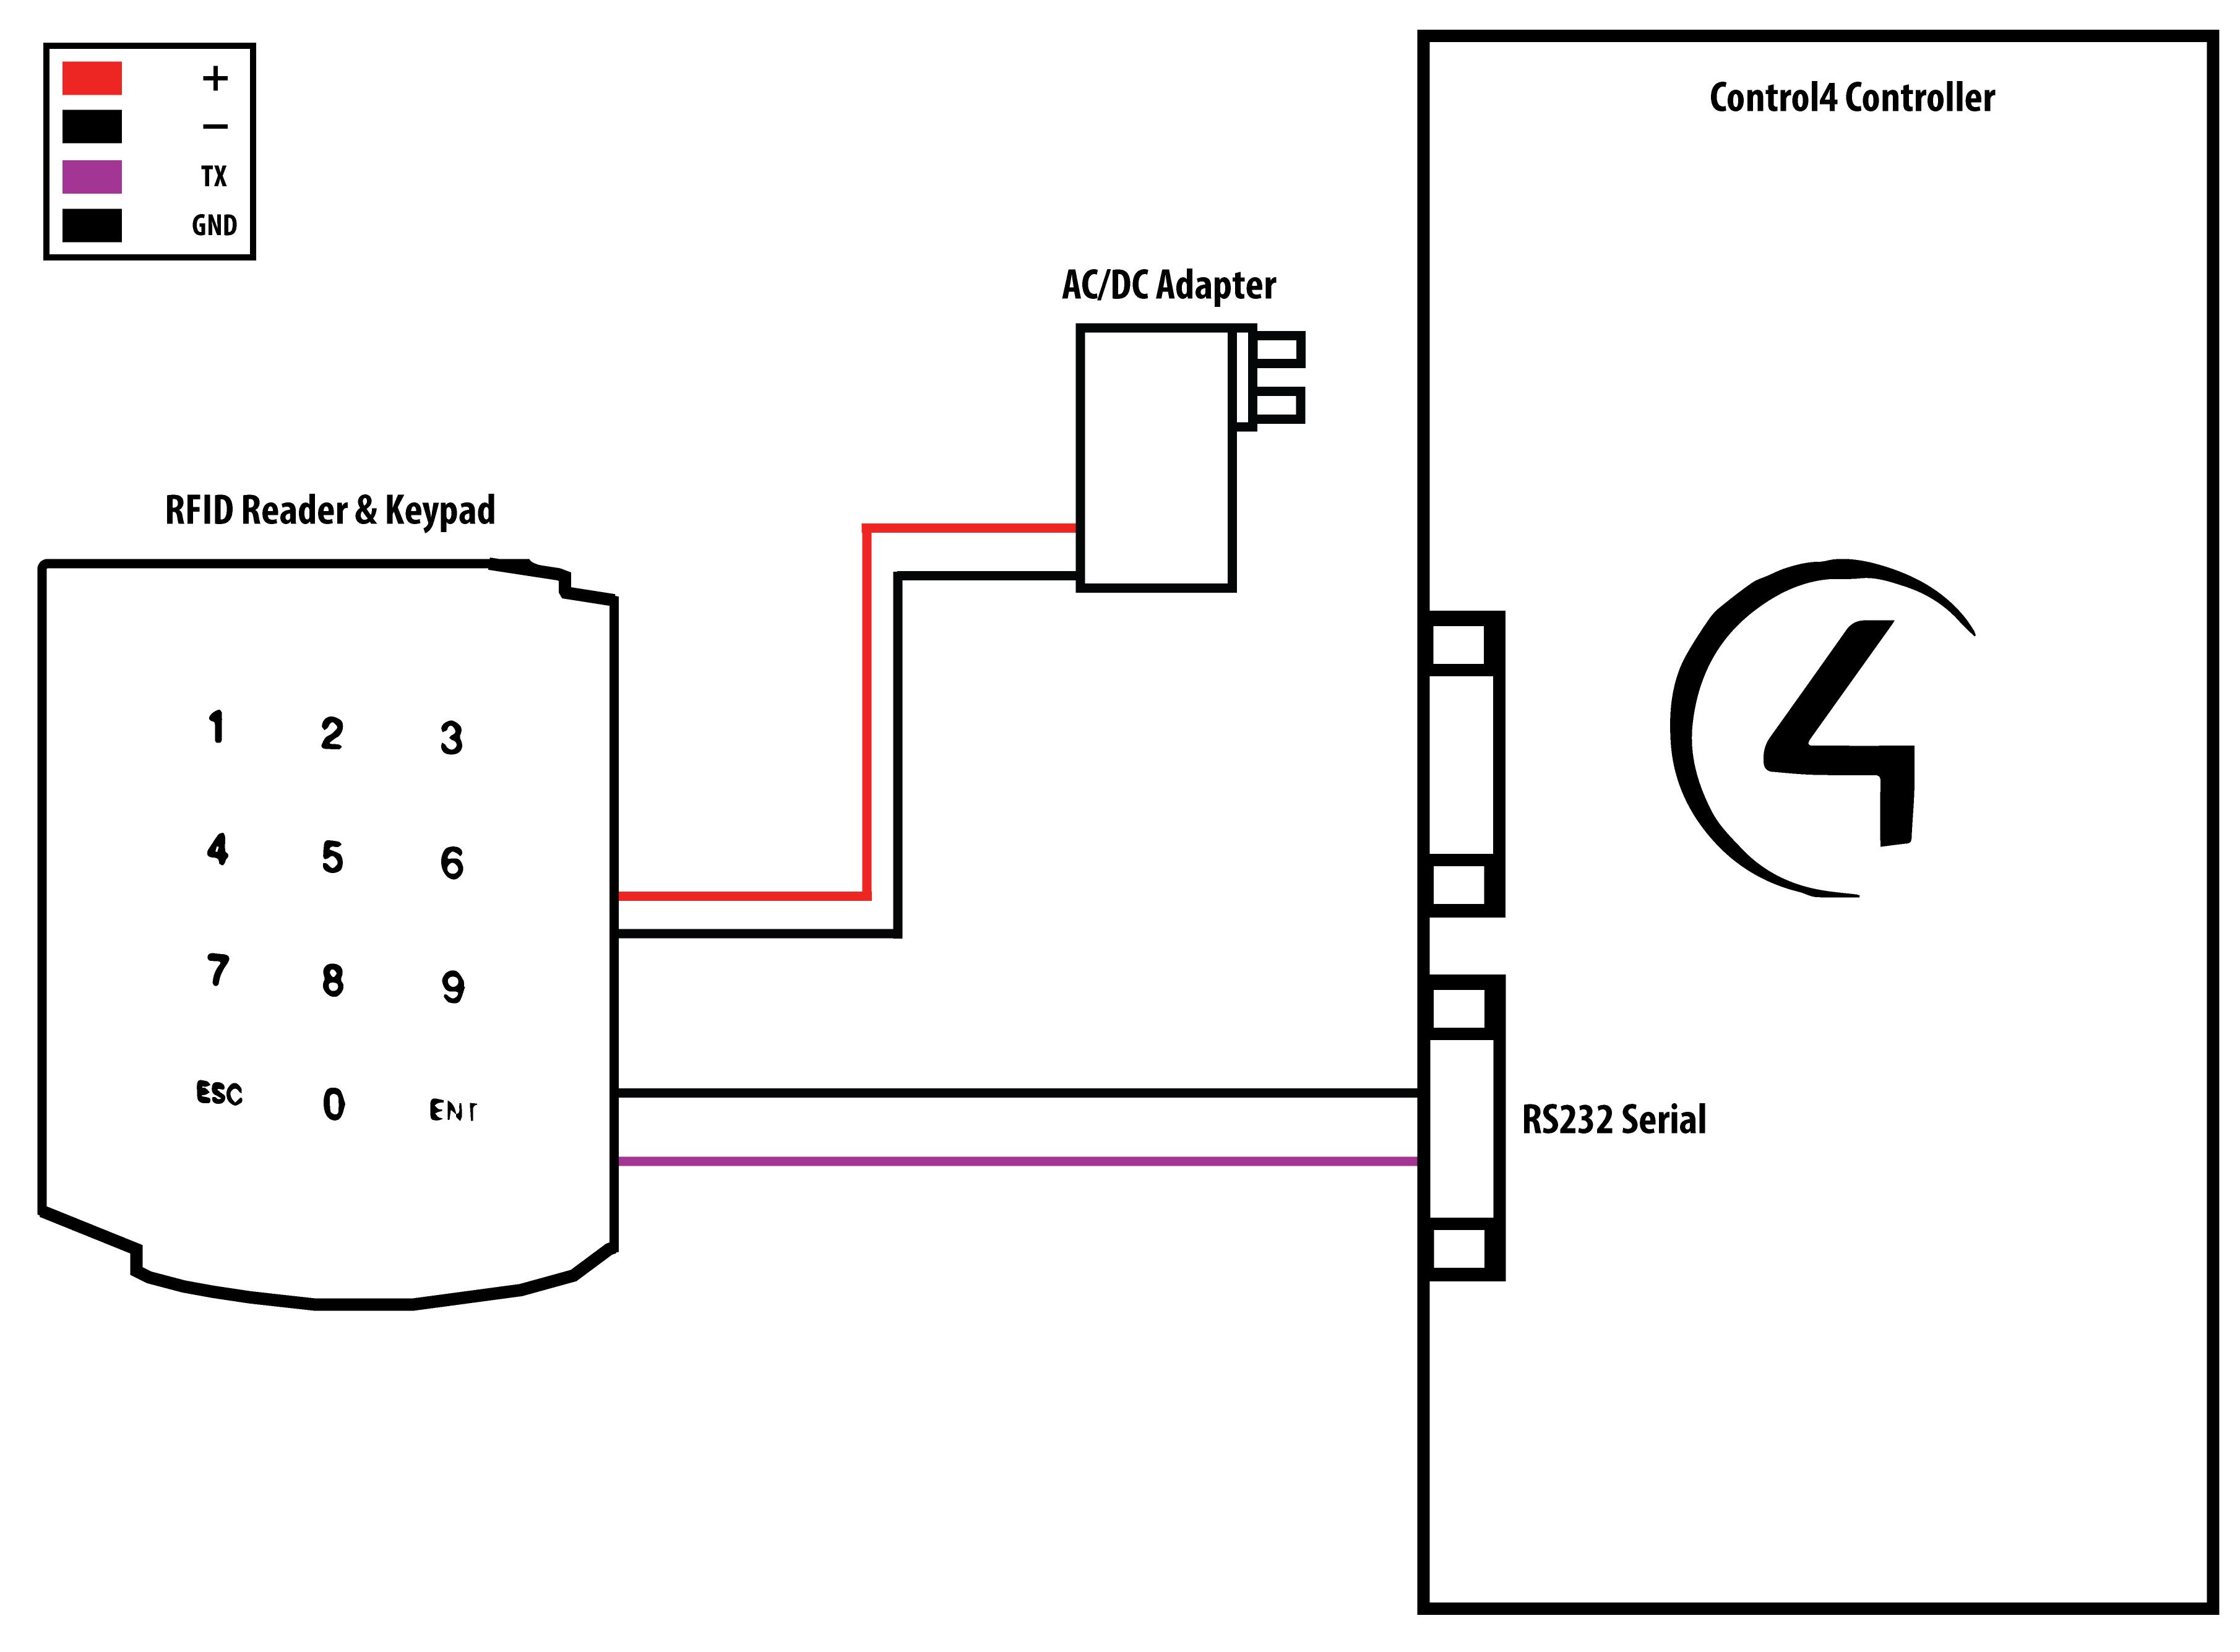 card reader wiring diagram - 1967 mustang heater wiring diagram for wiring  diagram schematics  wiring diagram schematics